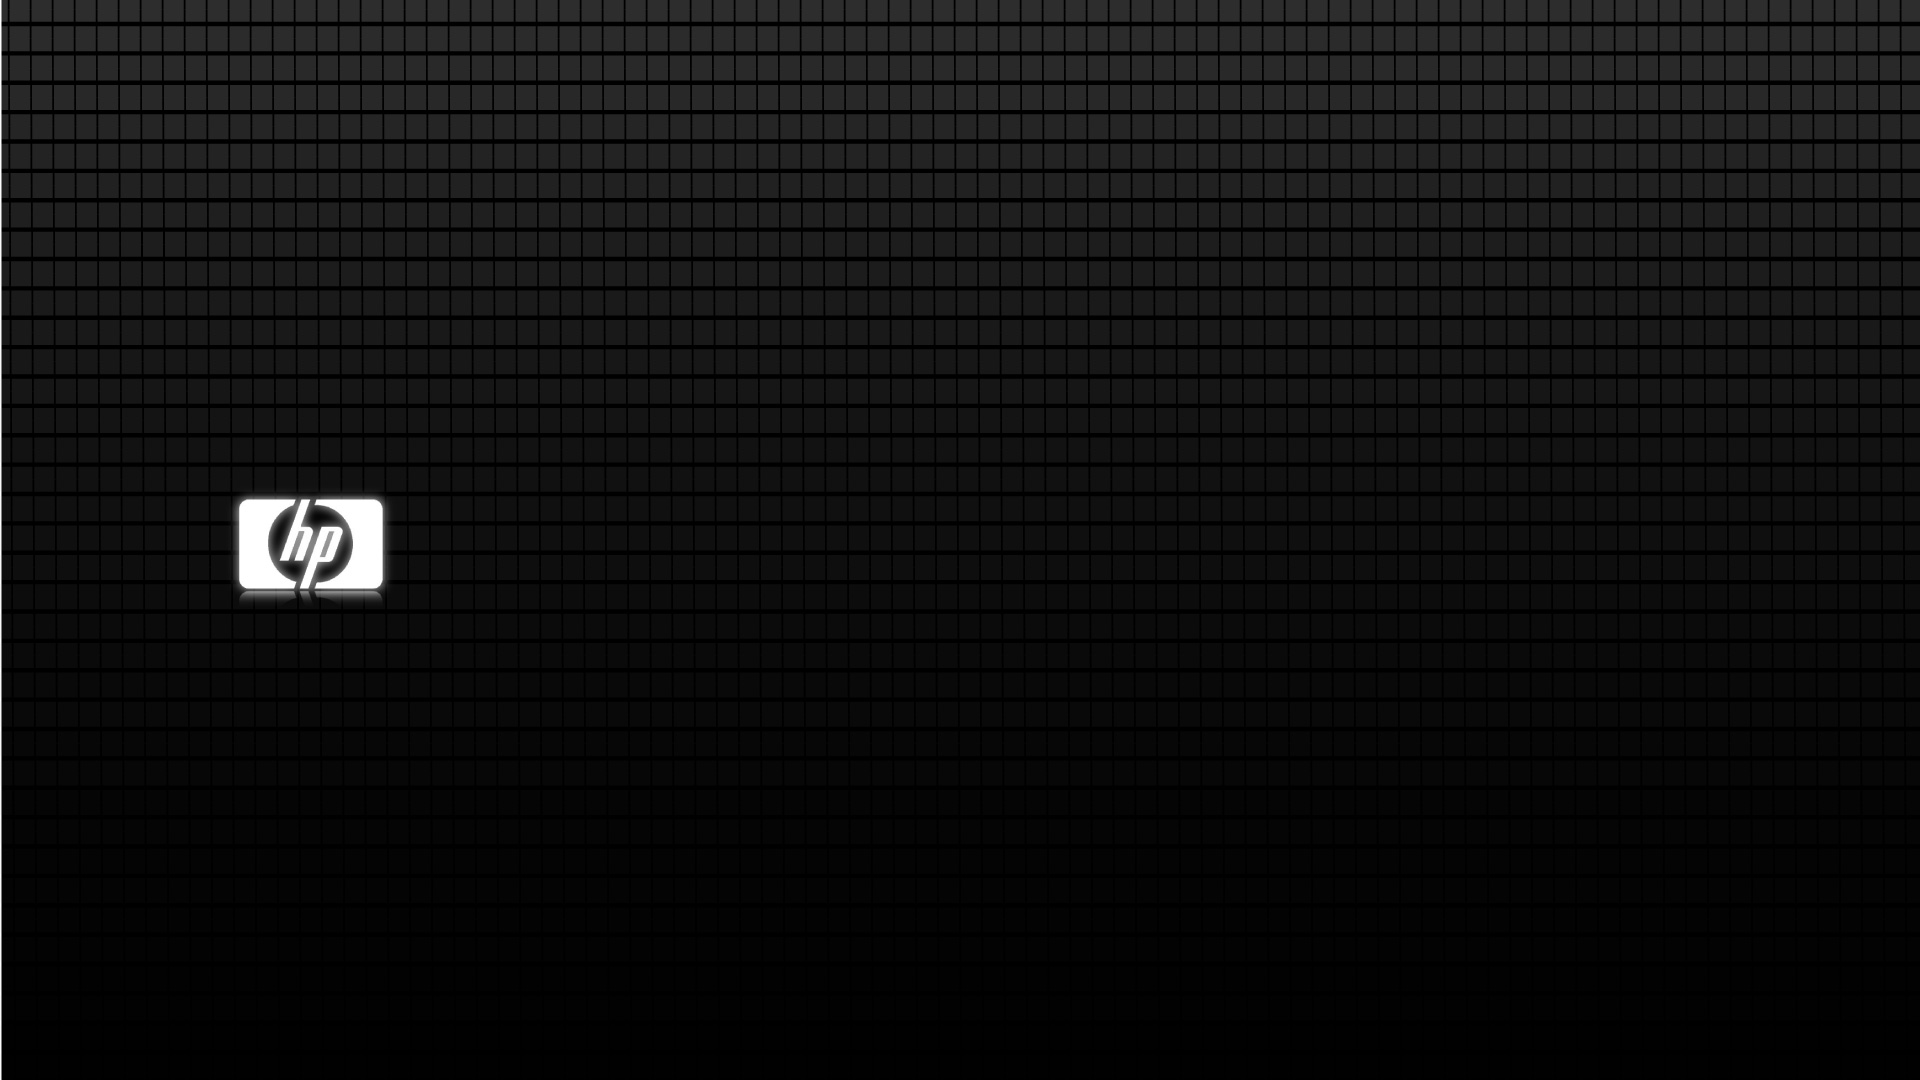 Hp Wallpapers Widescreen 19201080 123111 HD Wallpaper Res 1920x1080